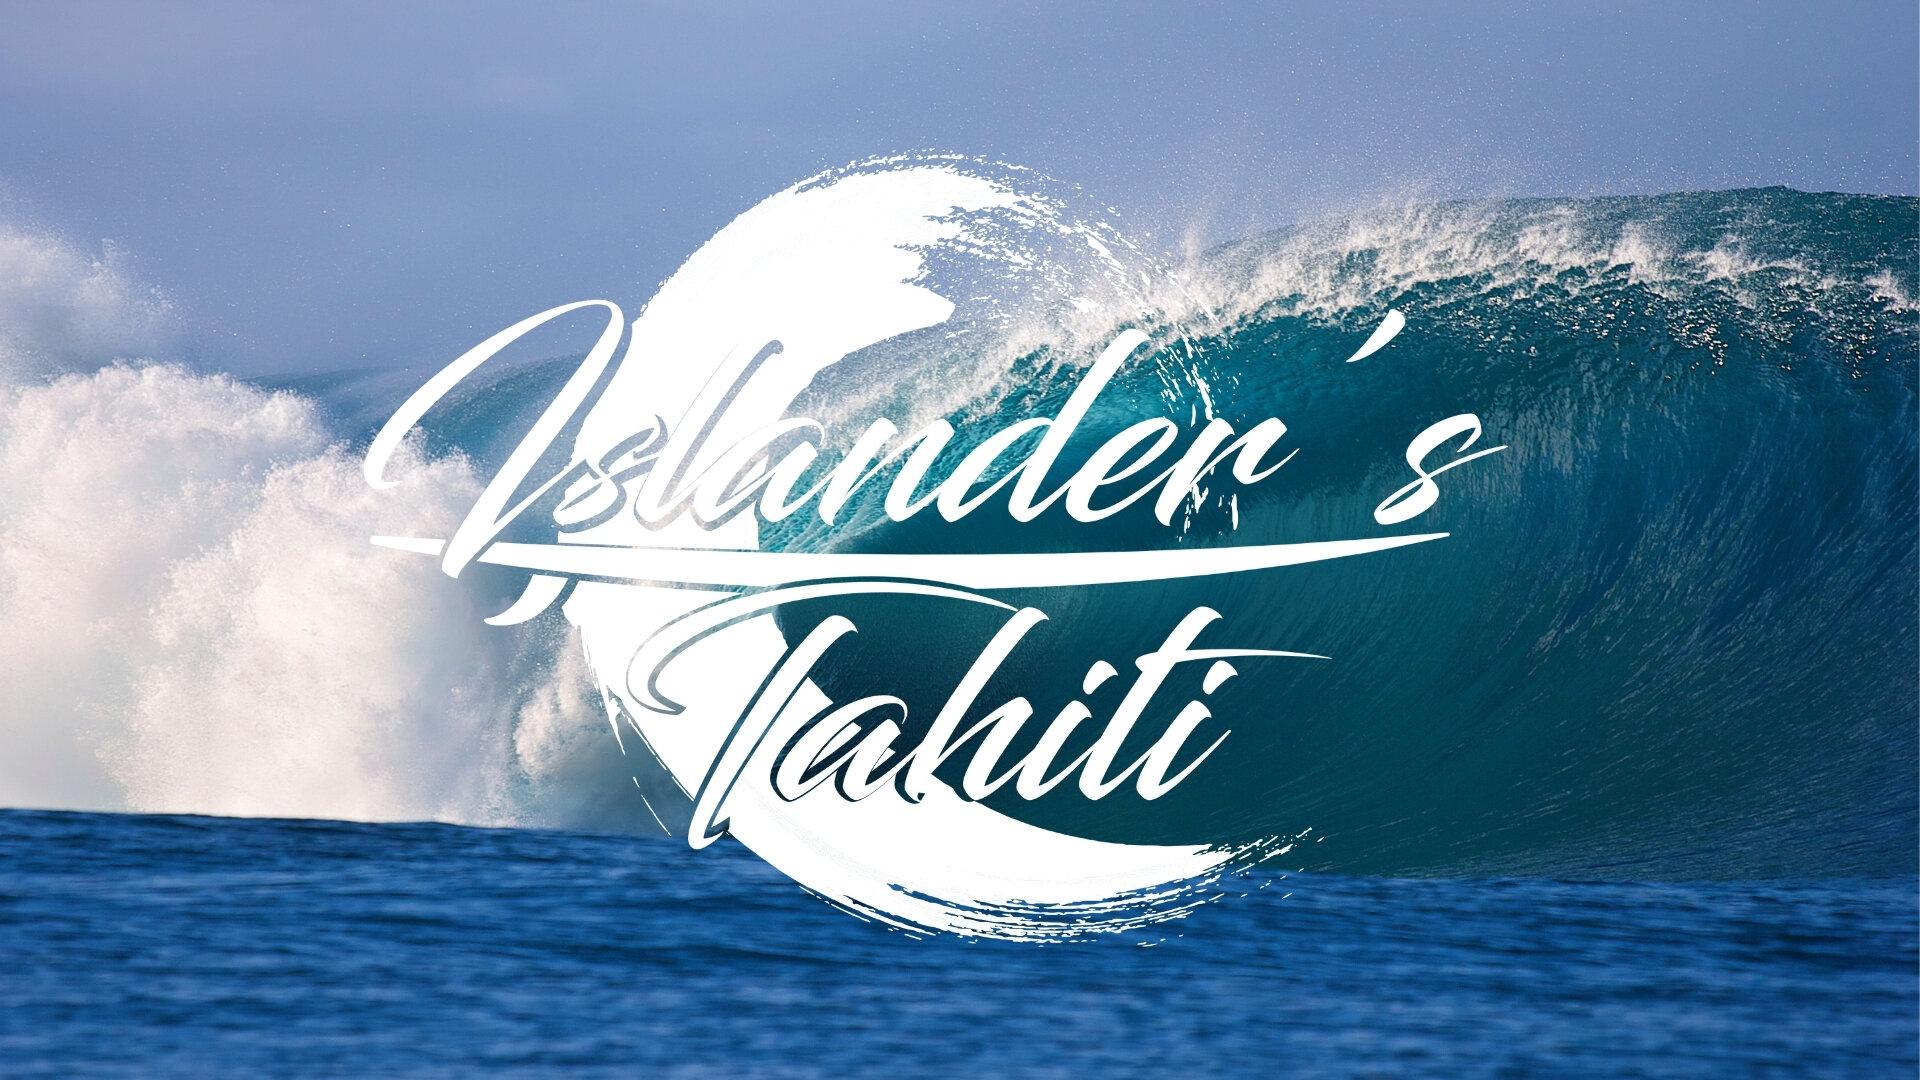 Islander's Tahiti